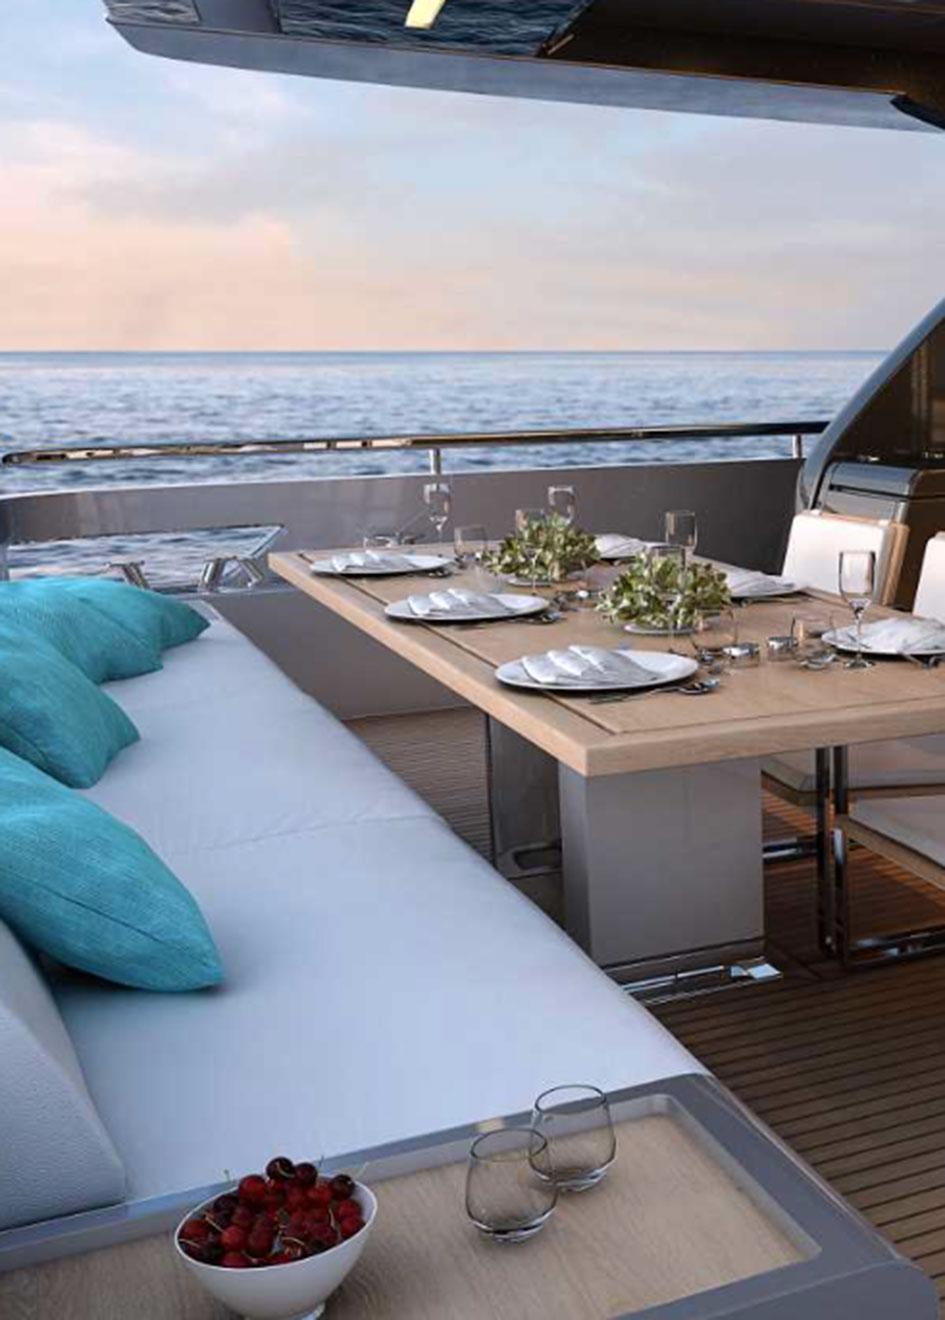 aft-deck-of-the-riva-100-corsaro-super-yacht